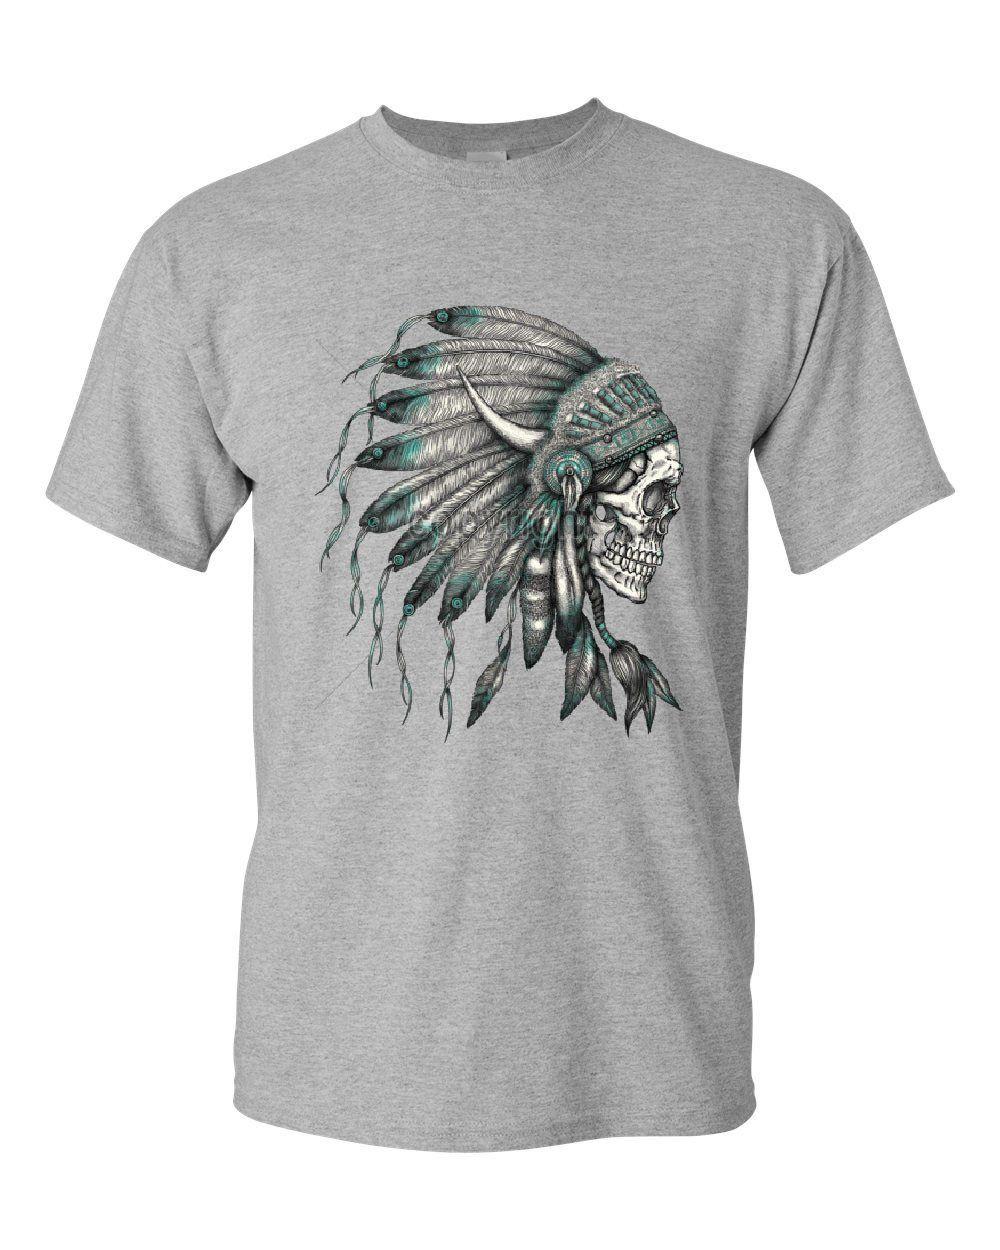 Indian Headdress Skull V-Neck T-Shirt Native American Tribe Tee